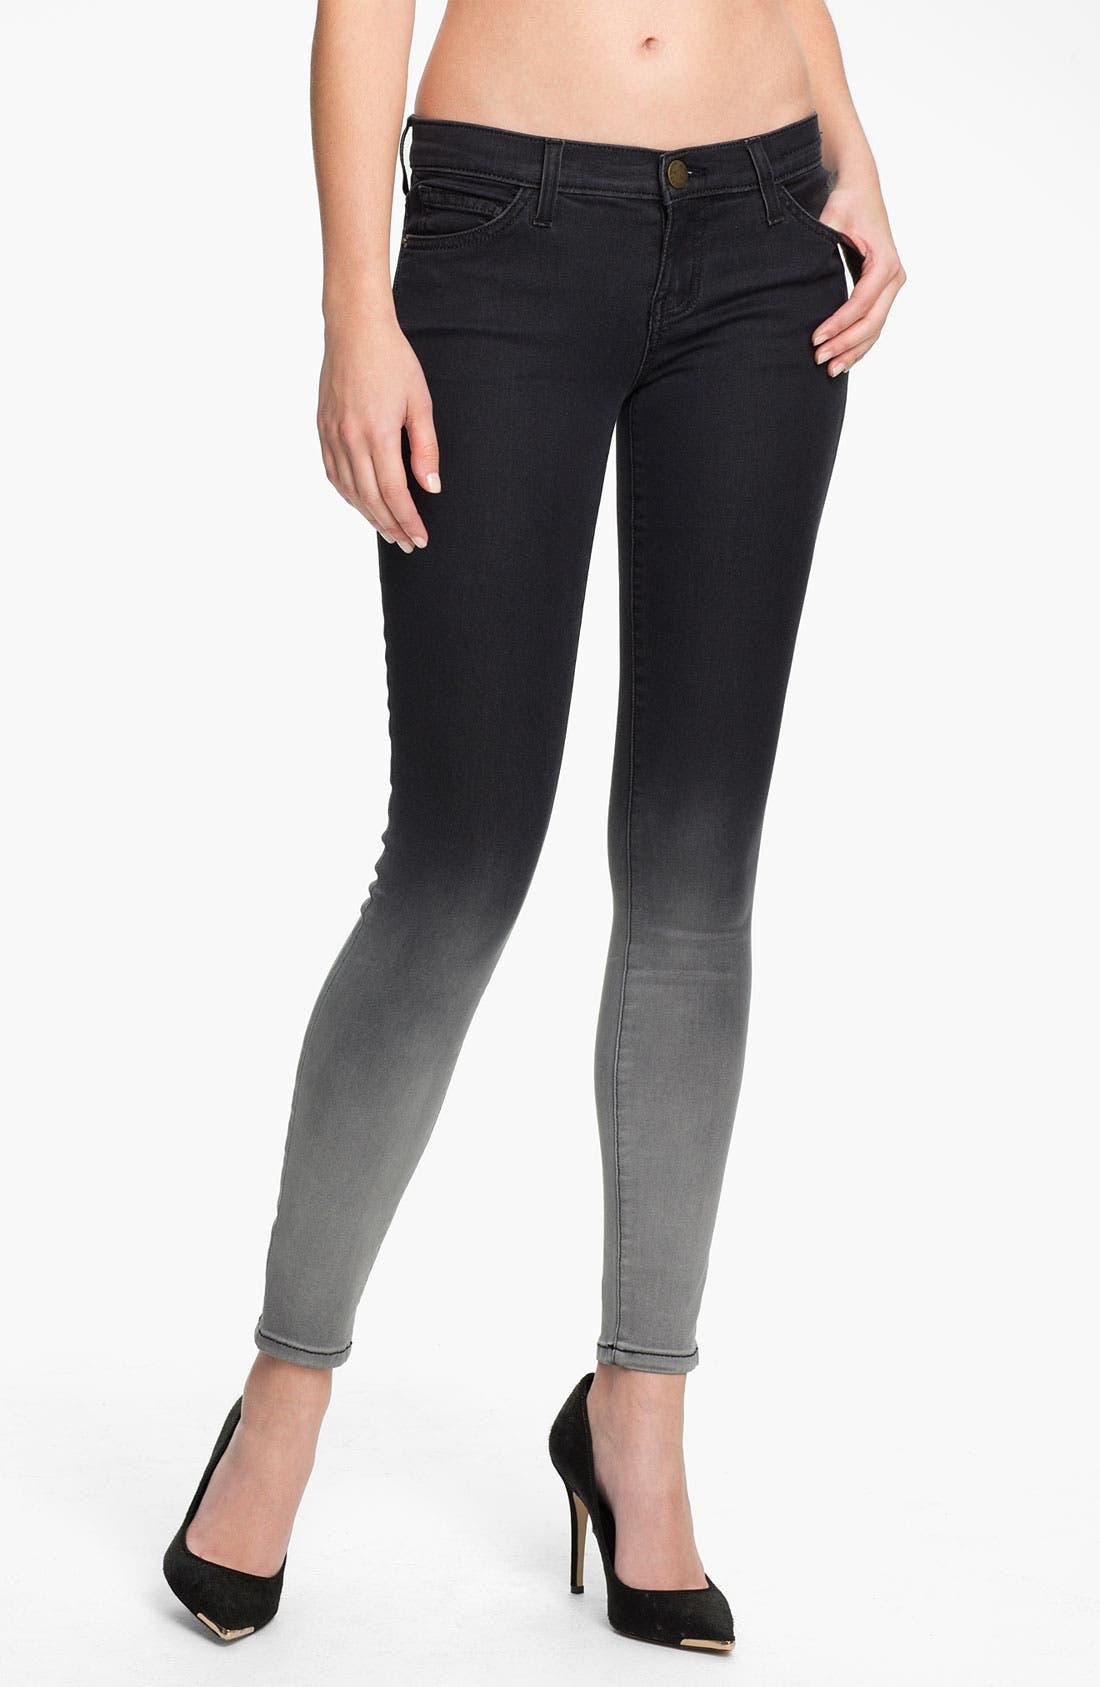 Main Image - Current/Elliott 'The Ankle' Print Crop Skinny Jeans (Black Fade)